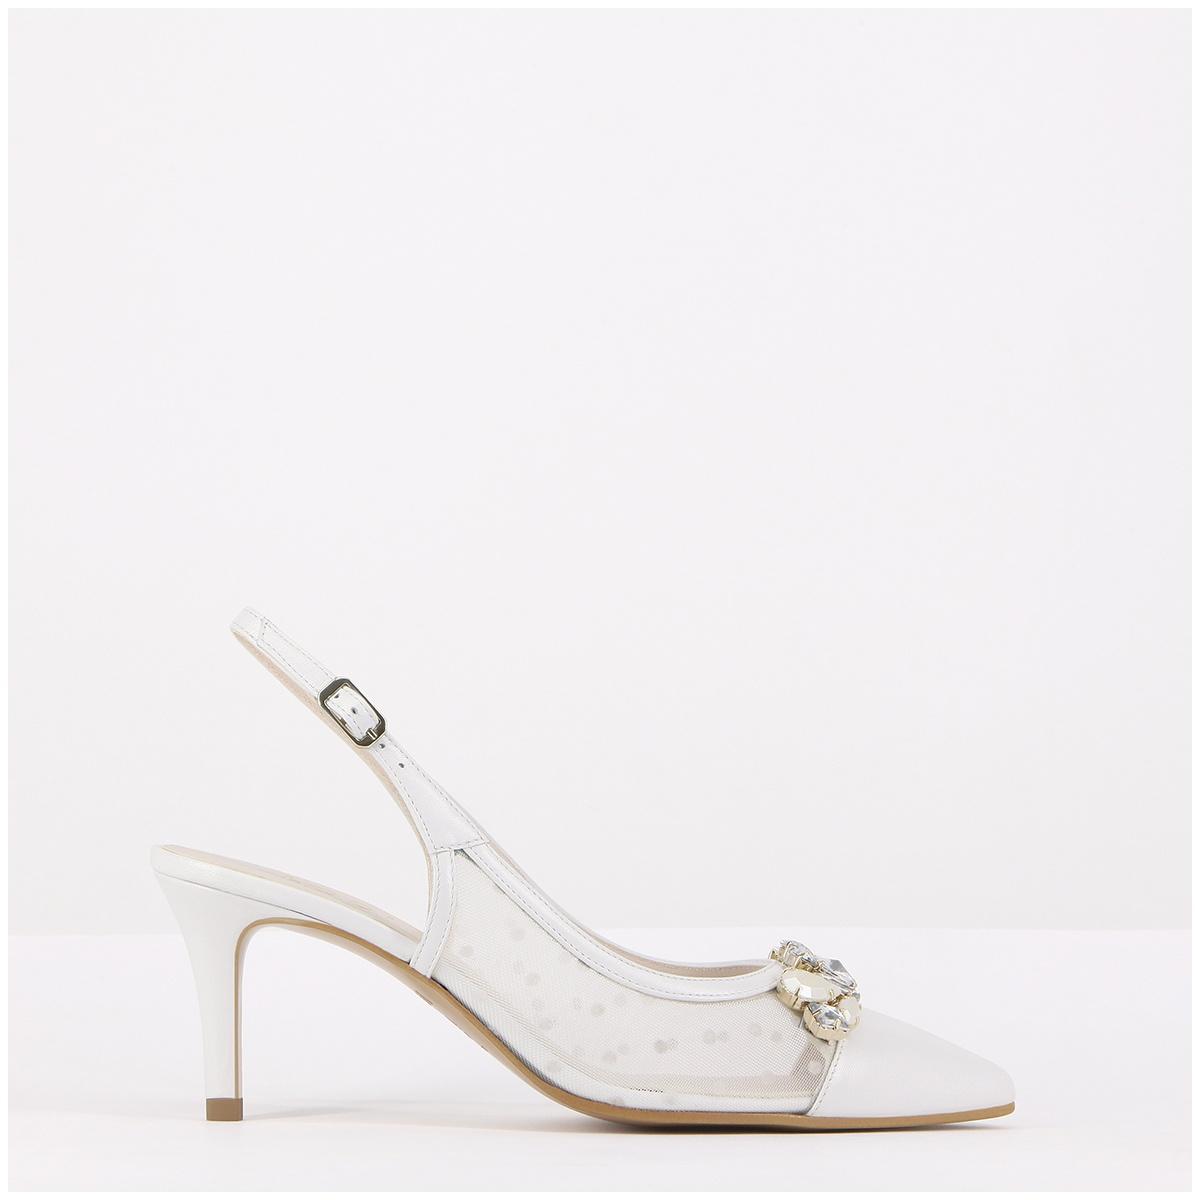 Estilo Originales LodiPara Bodas Novias ▷ De Zapatos Con Blog rxBdCoe